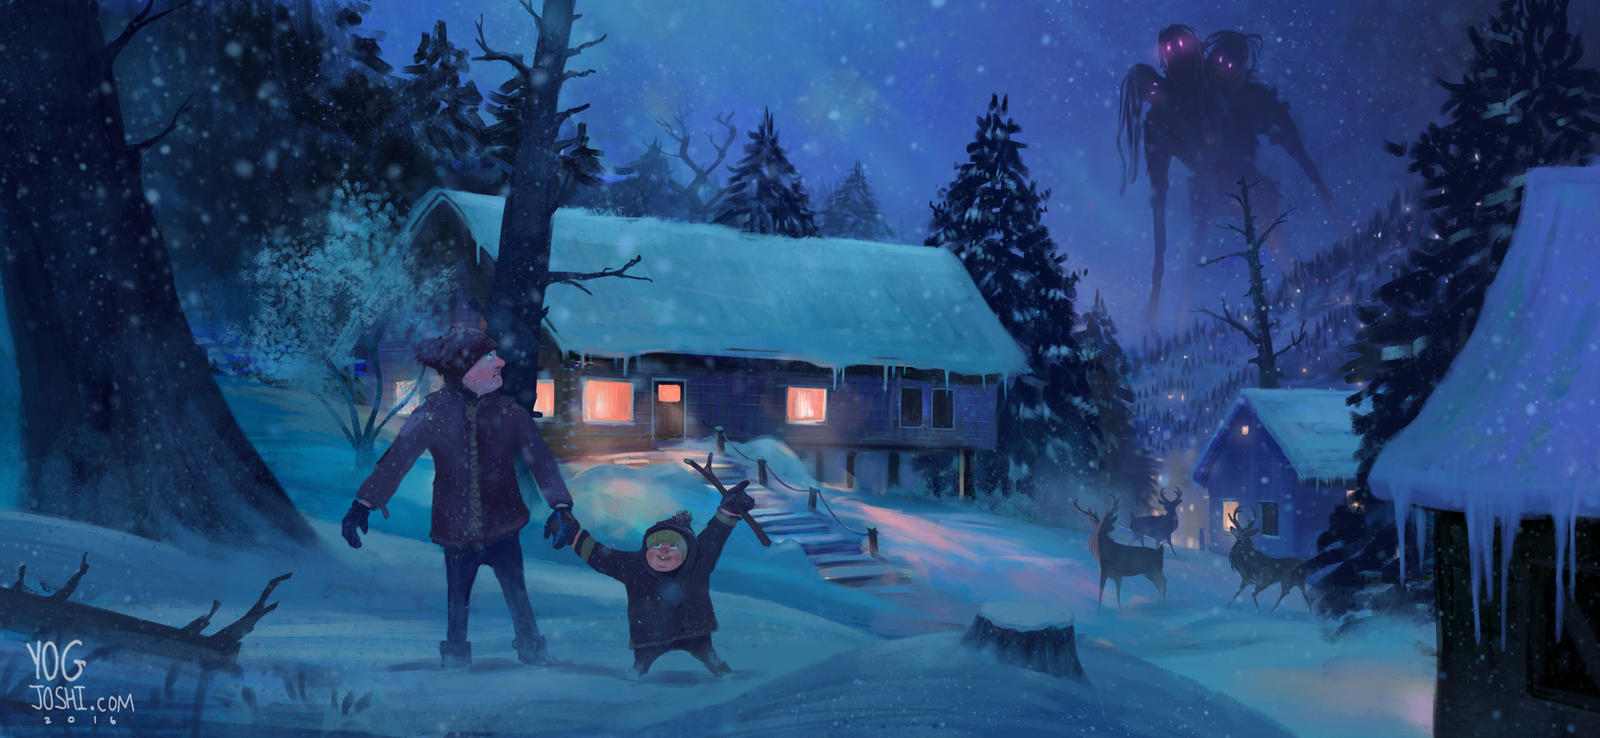 Winter Night by Yog Joshi by YogFingers on DeviantArt